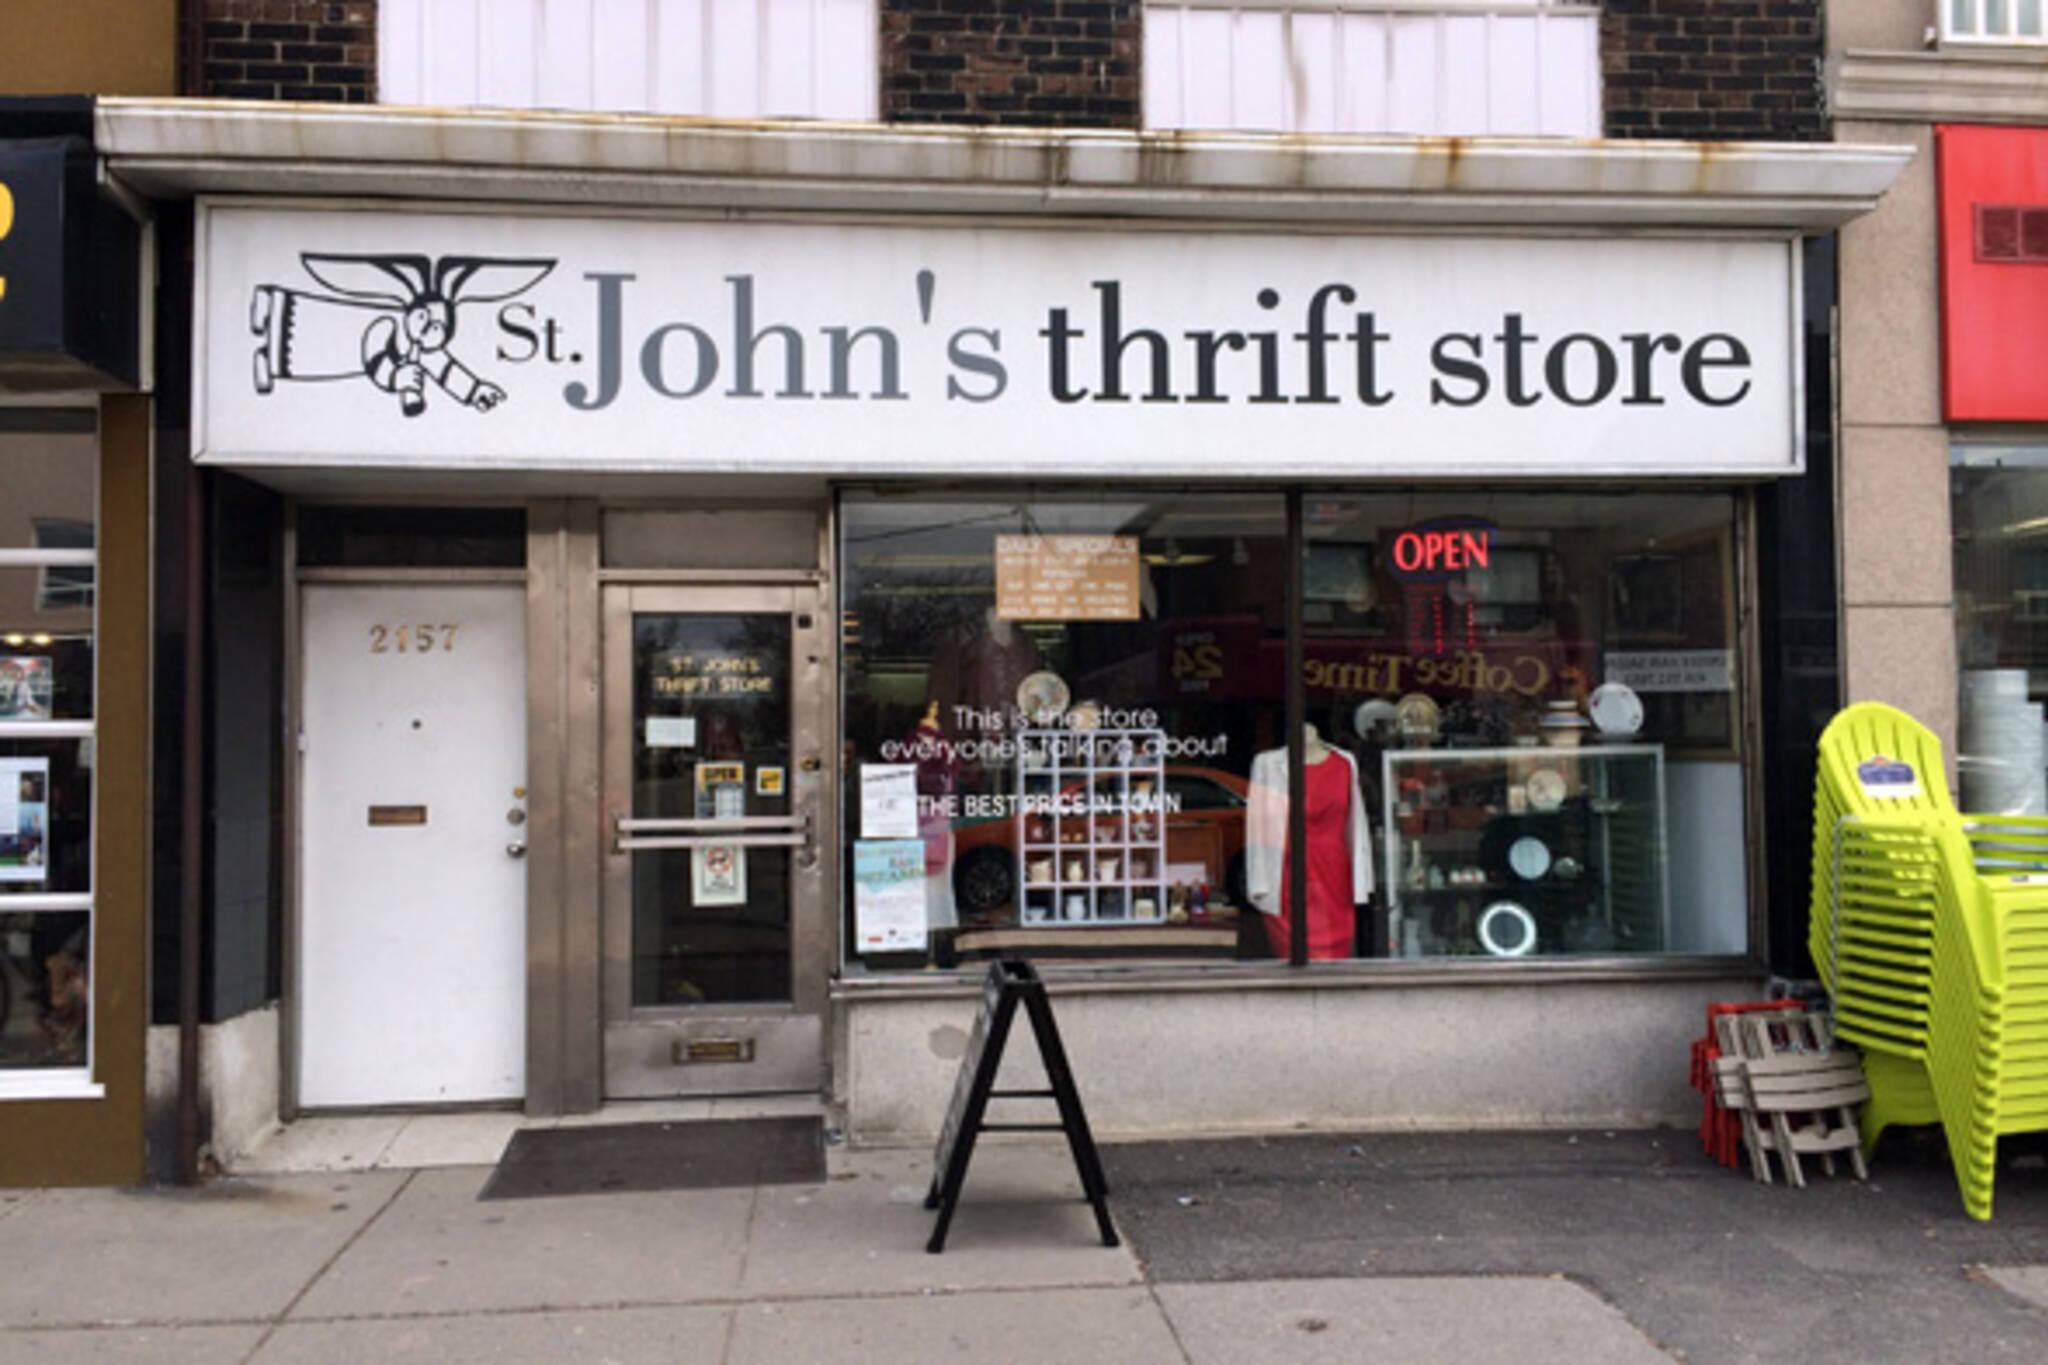 st johns thrift store